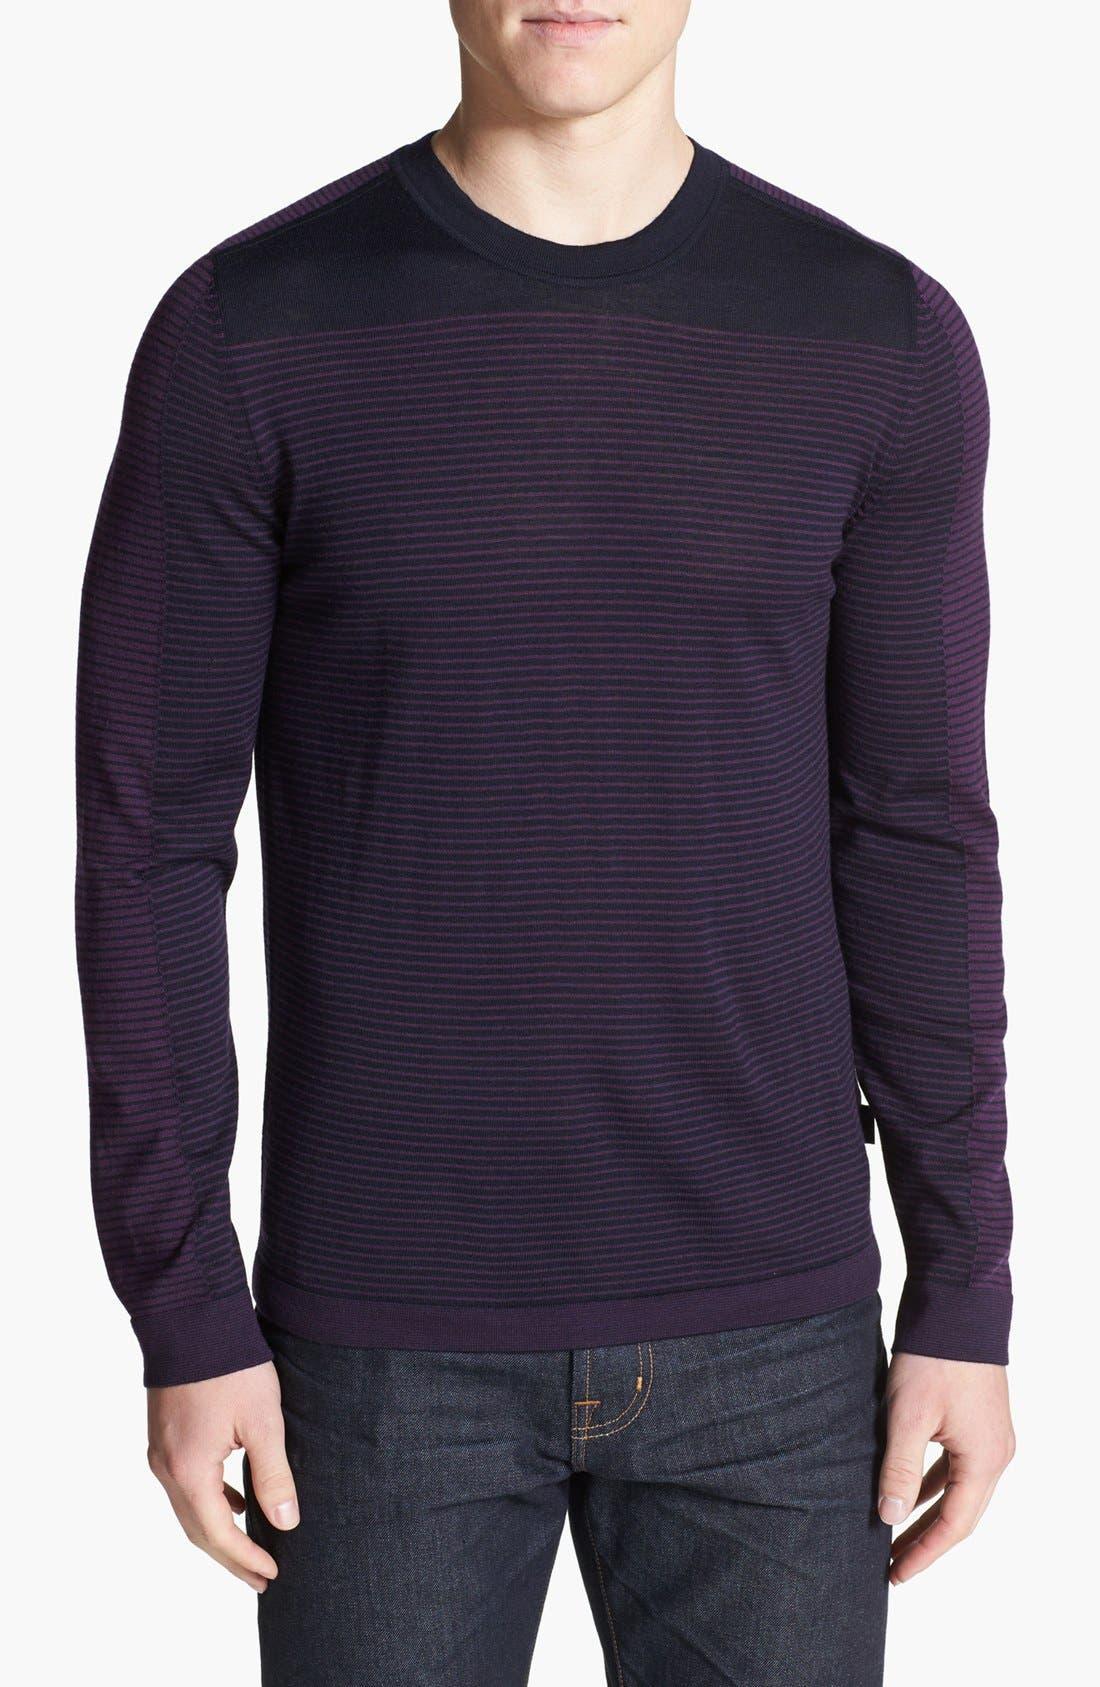 Alternate Image 1 Selected - BOSS HUGO BOSS 'Merro' Merino Wool Sweater